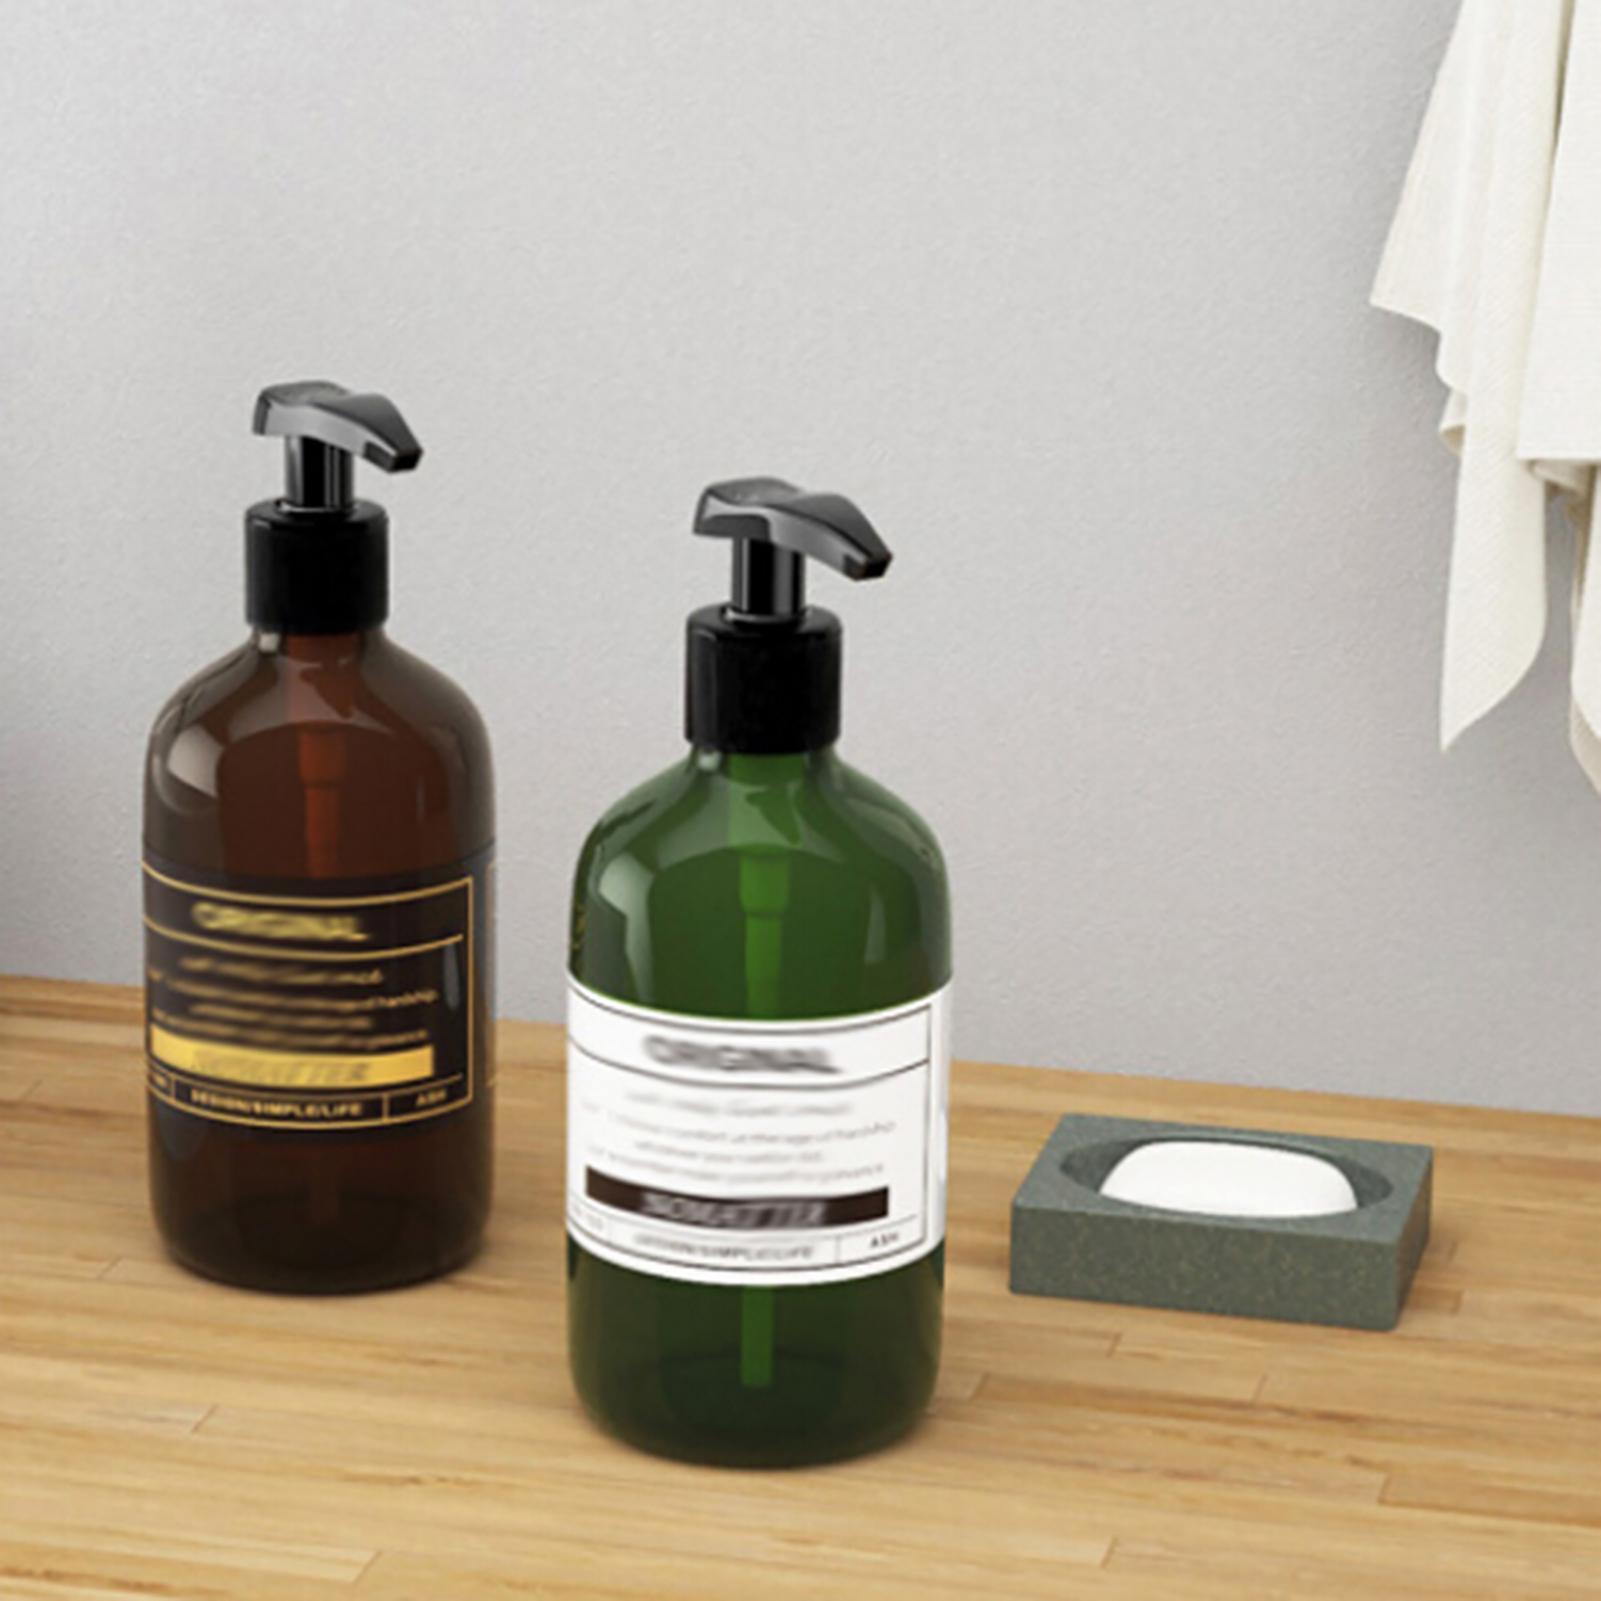 500ml Refillable Bottle Press Pump Shampoo Soap Lotion Makeup Liquid Dispenser